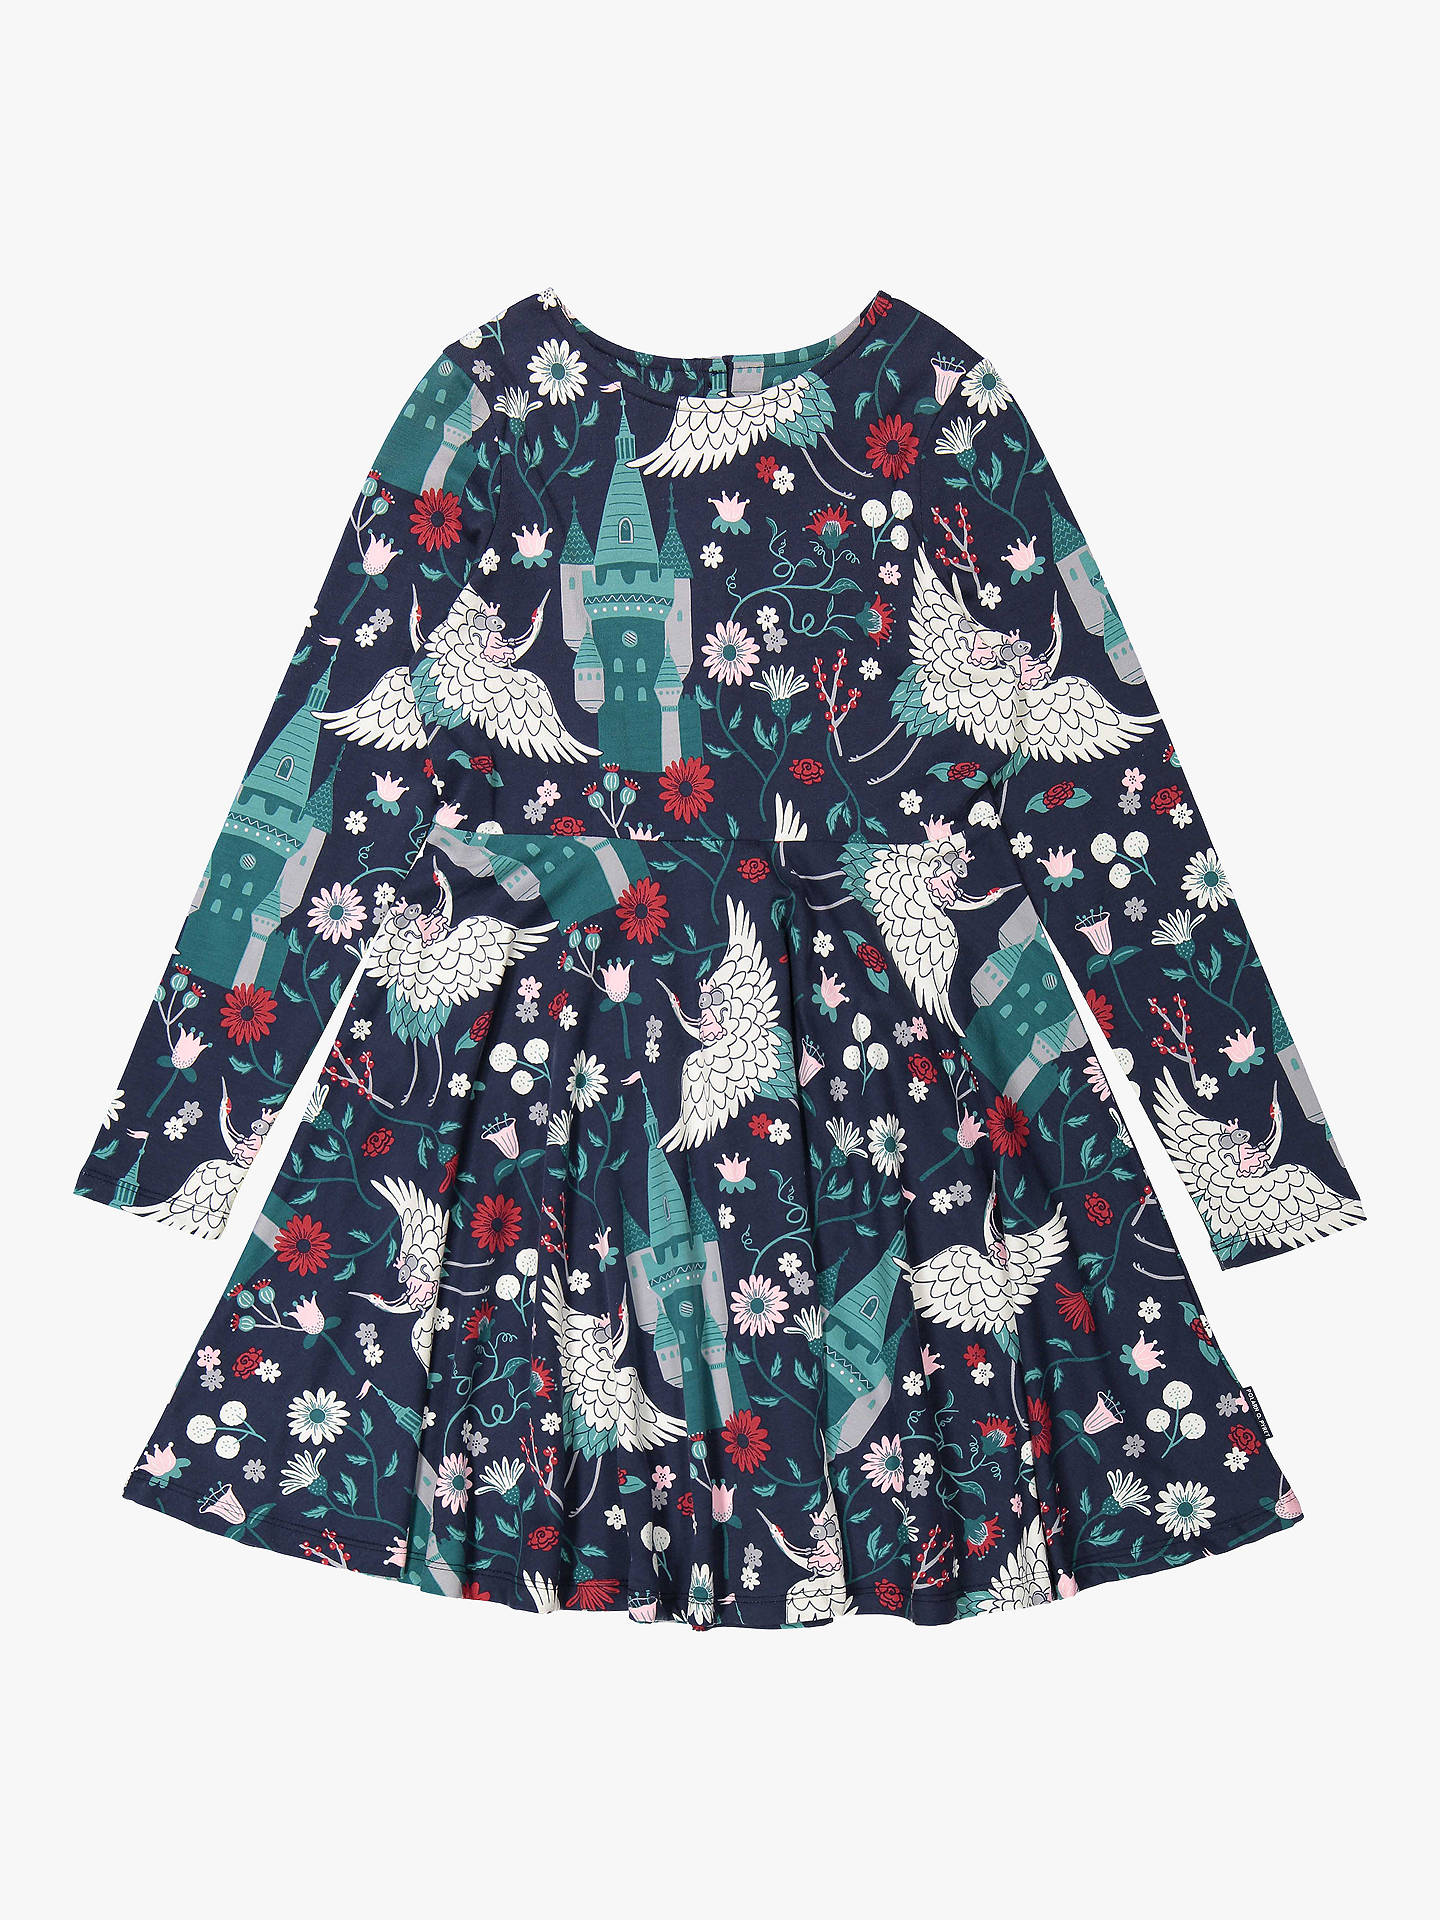 bdecd481c Polarn O. Pyret Children s Fairytale Dress